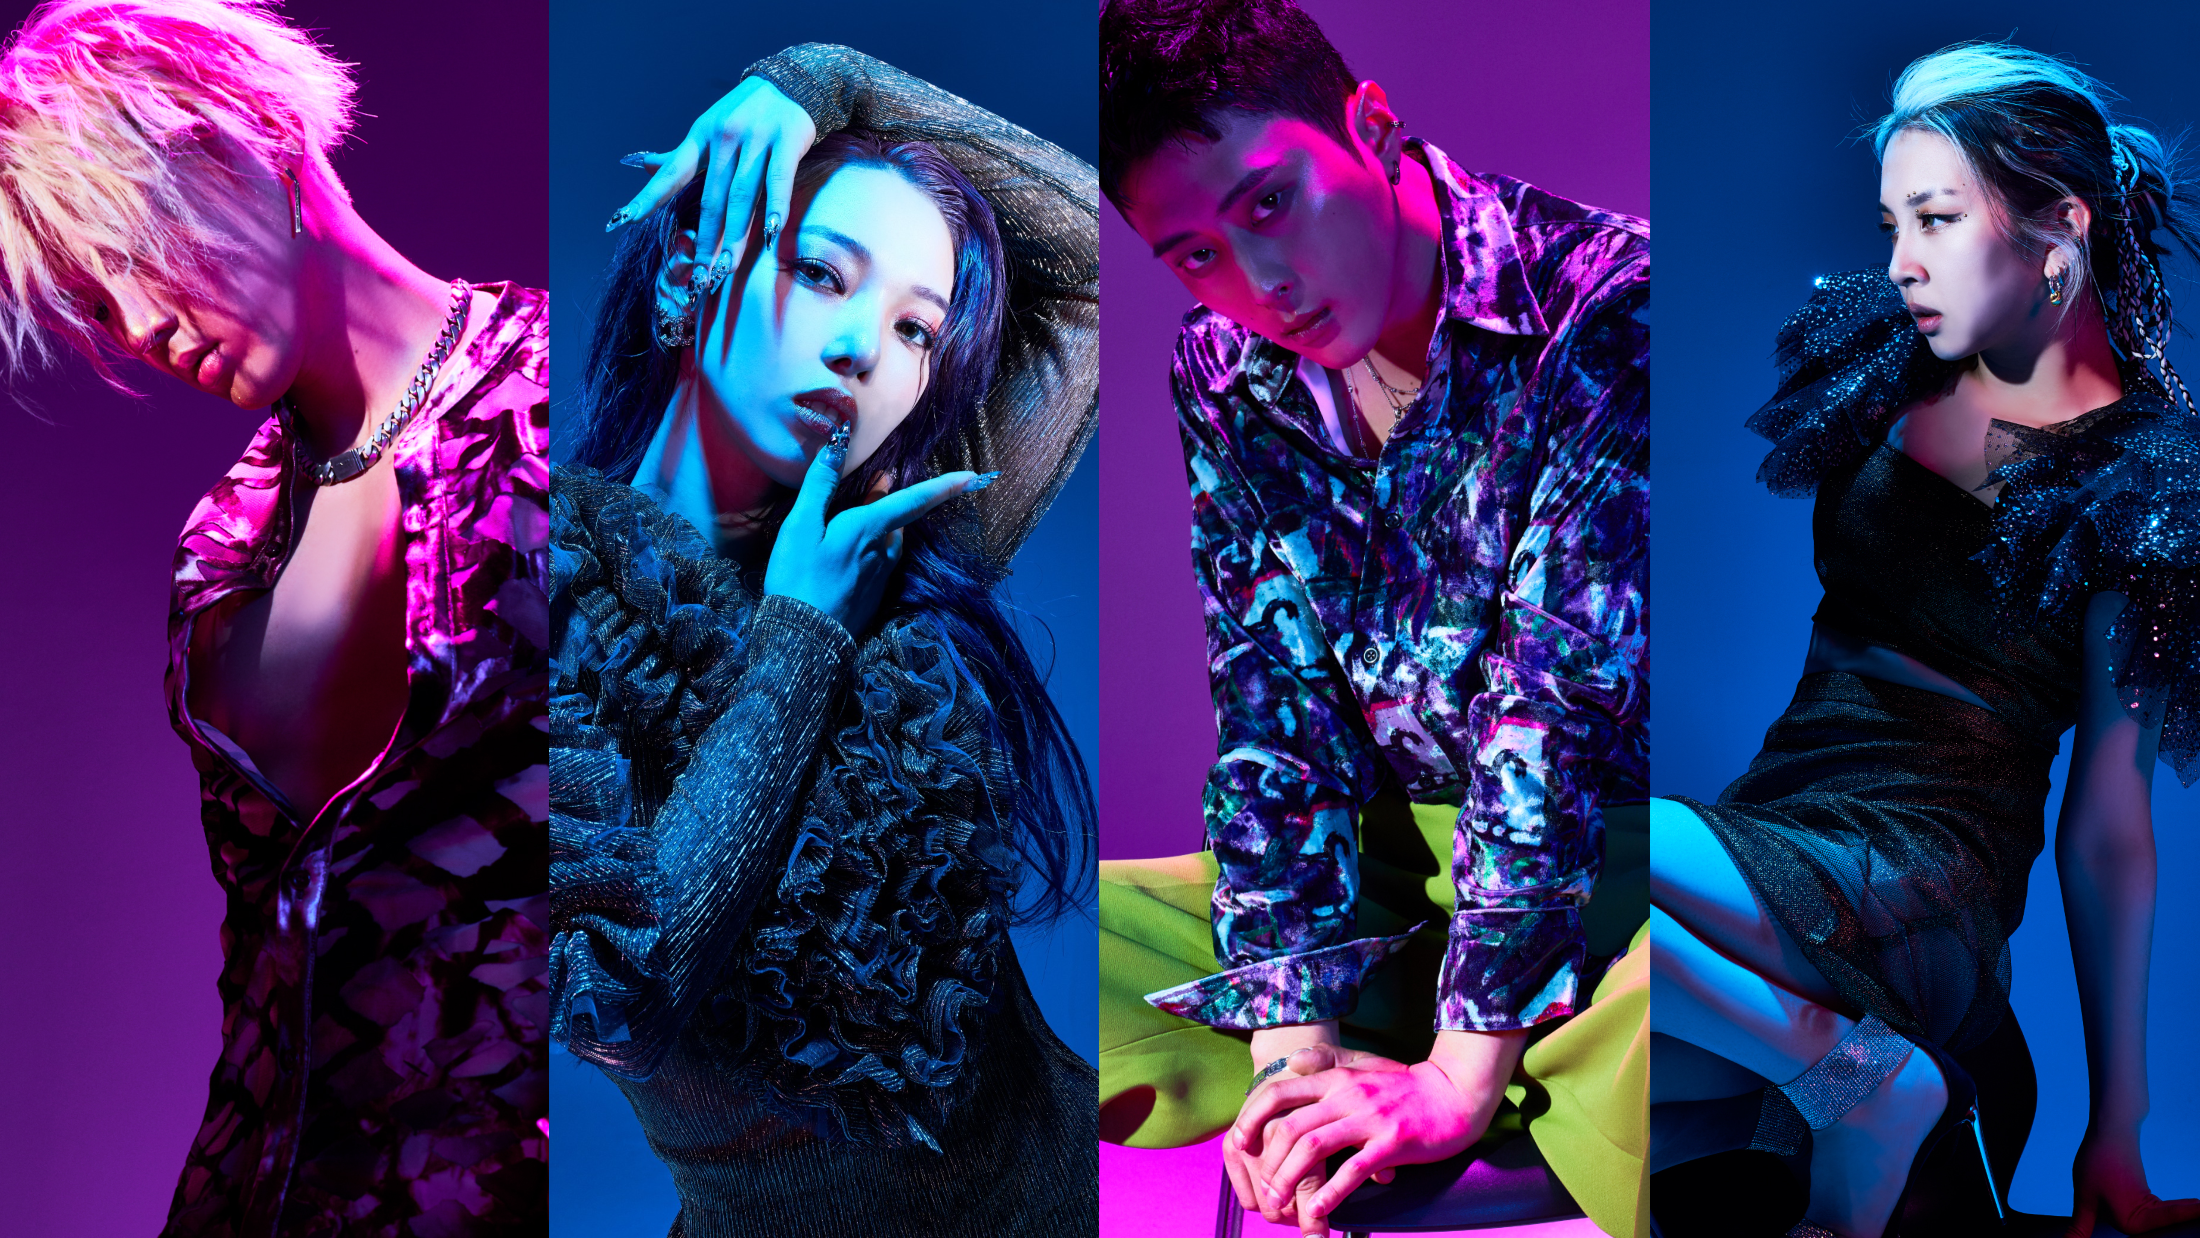 KARD 新單曲開放預購!以〈Gunshot〉為首收錄三首歌